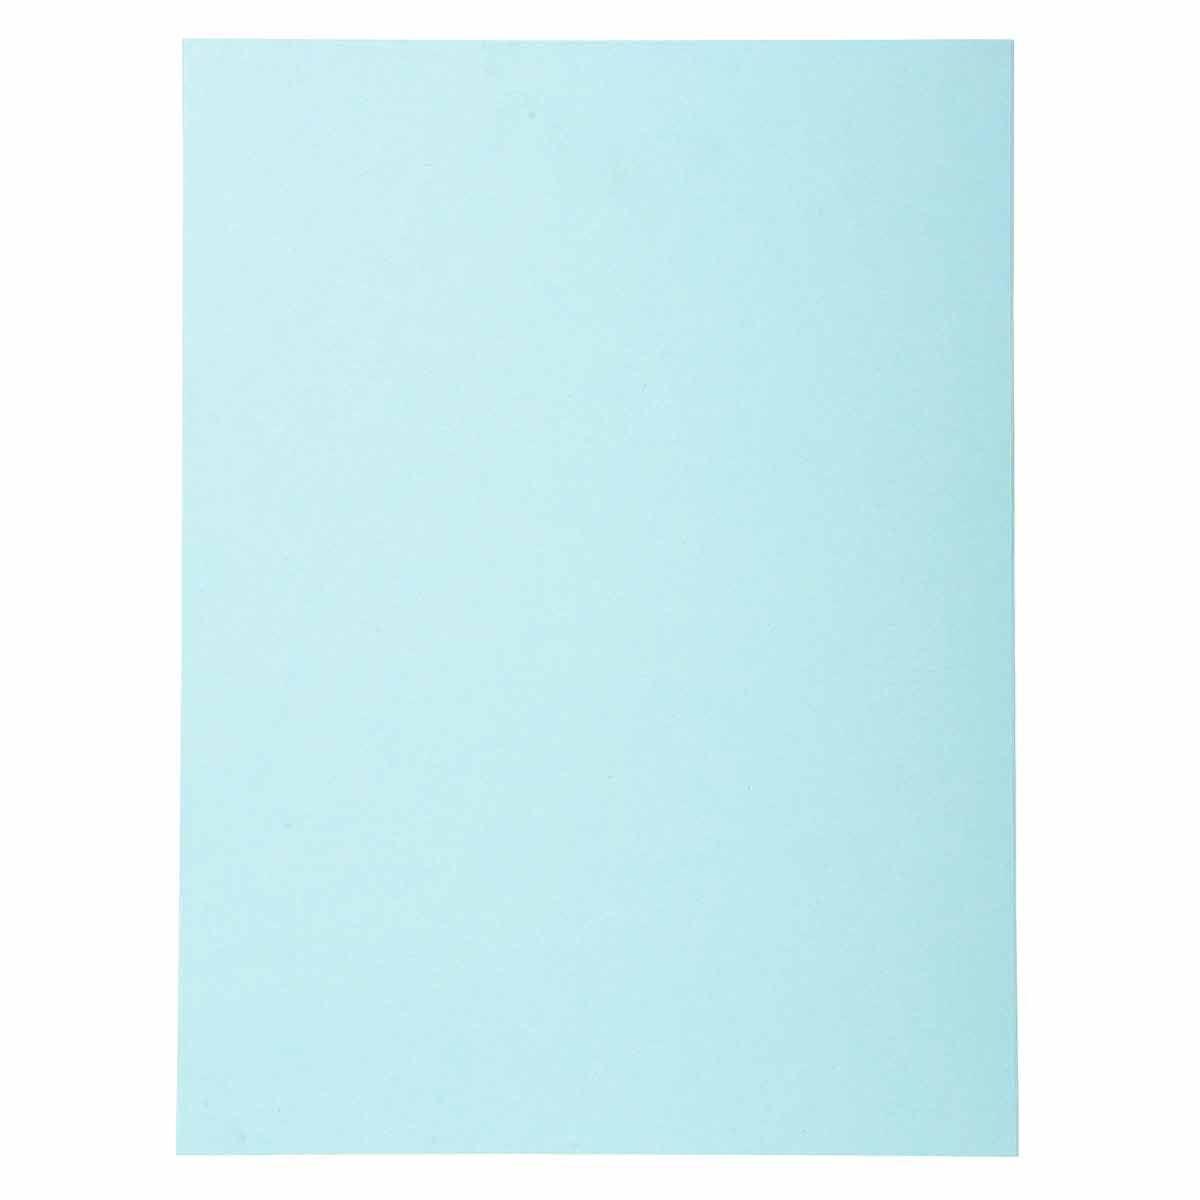 Exacompta Forever Square Cut Folders A4 170gsm 5 Packs of 100 Light Blue